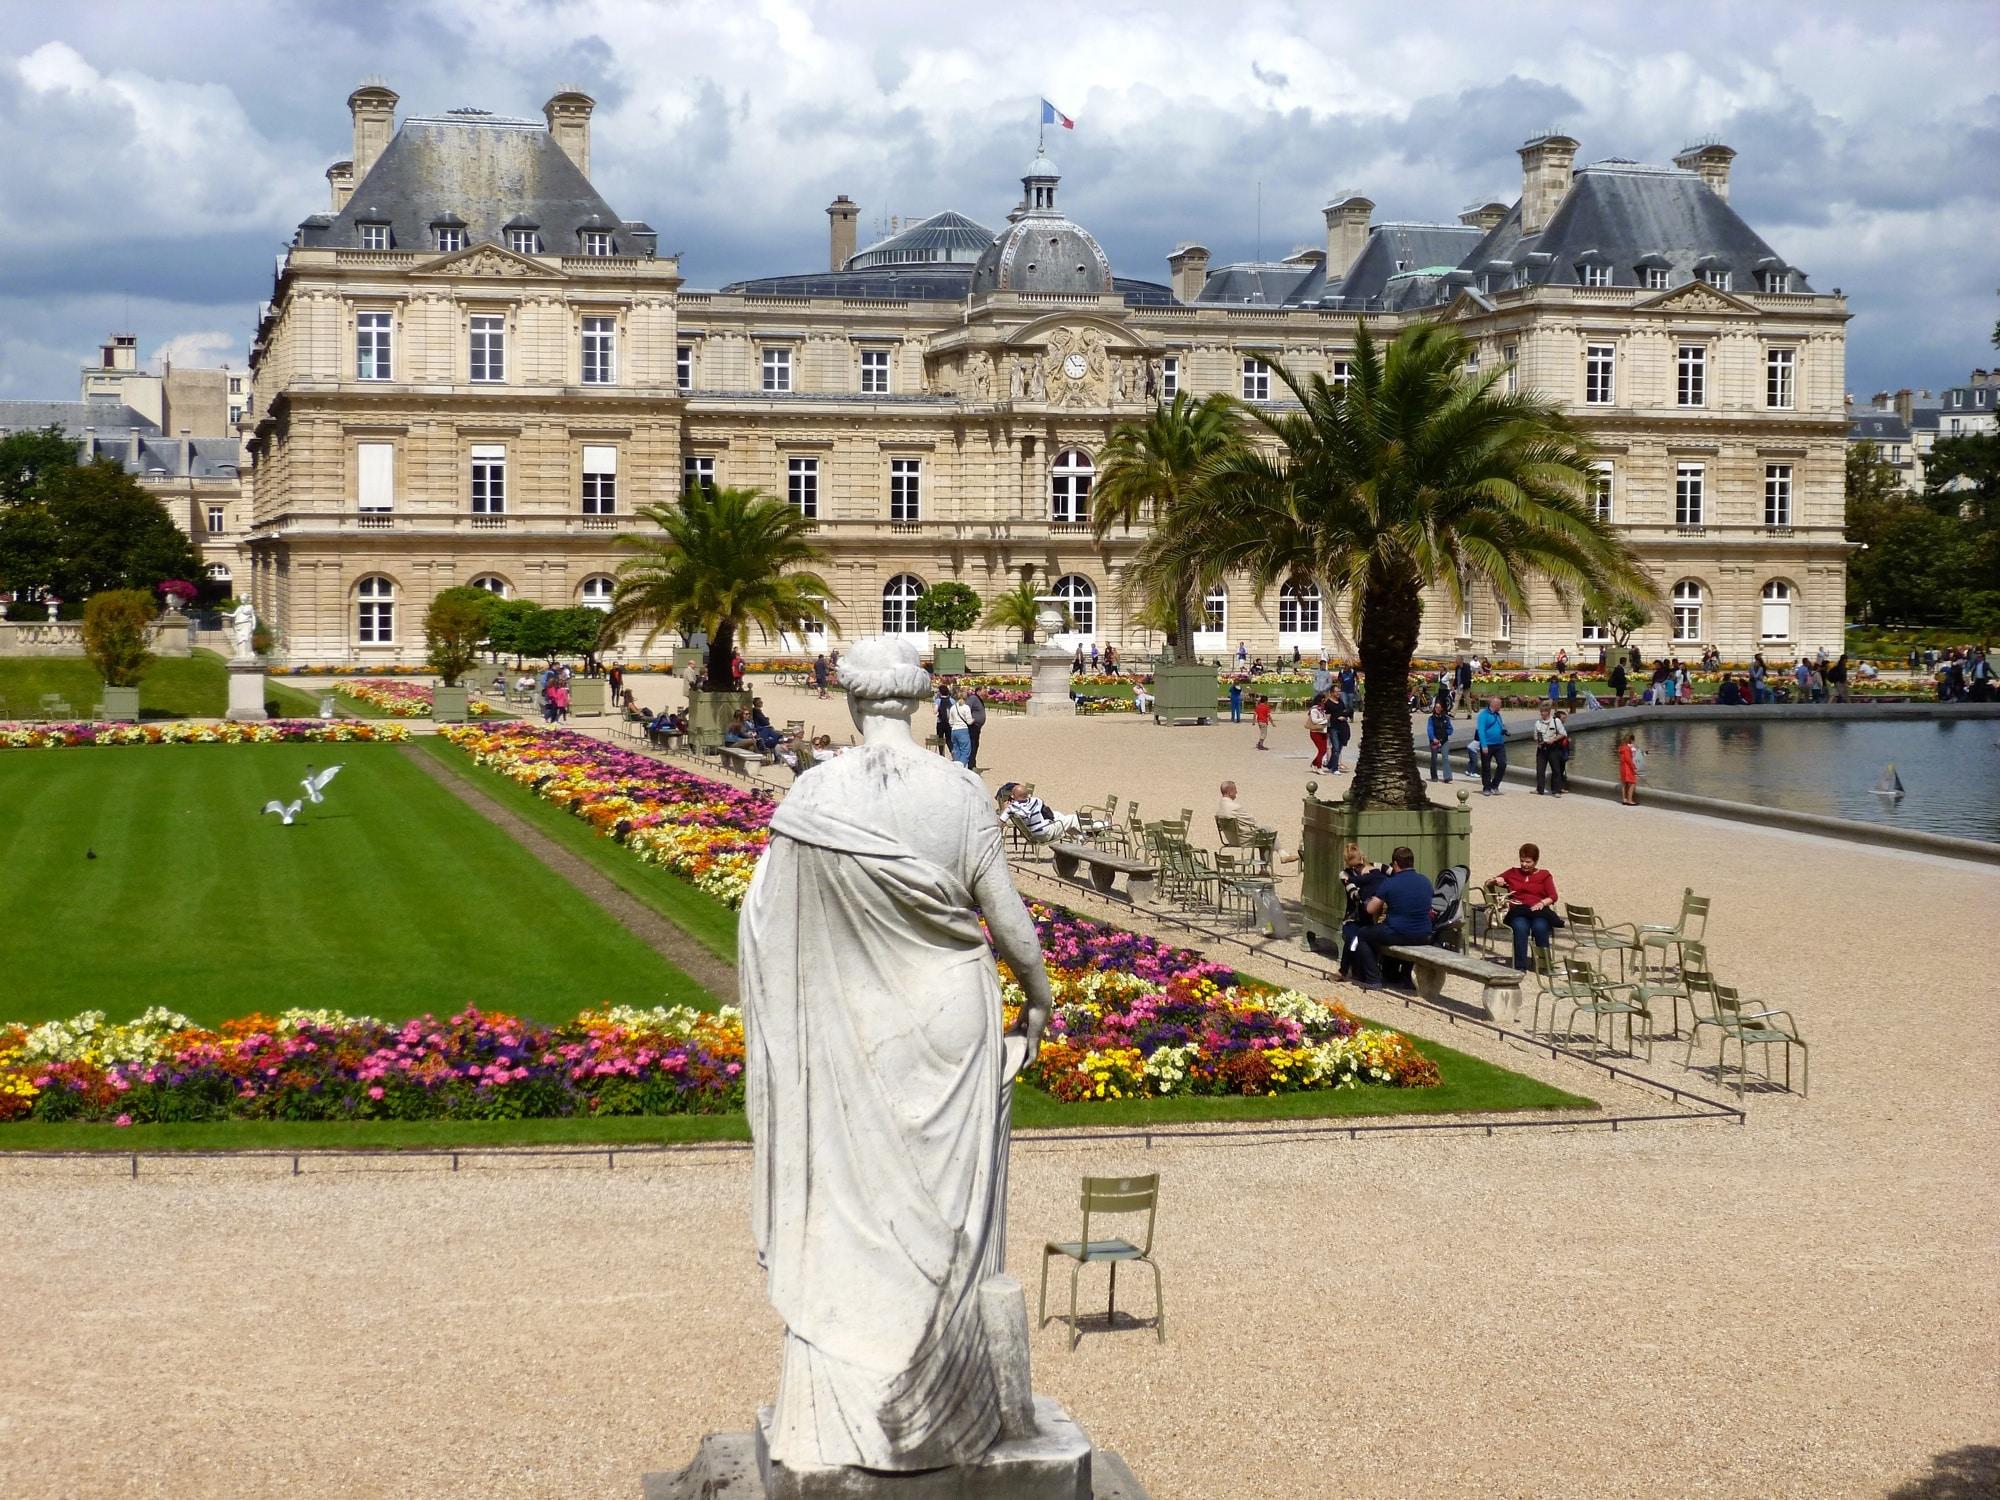 Un moment de d u00e9tente et de r u00eaverie au Jardin du Luxembourg  u00e0 Paris